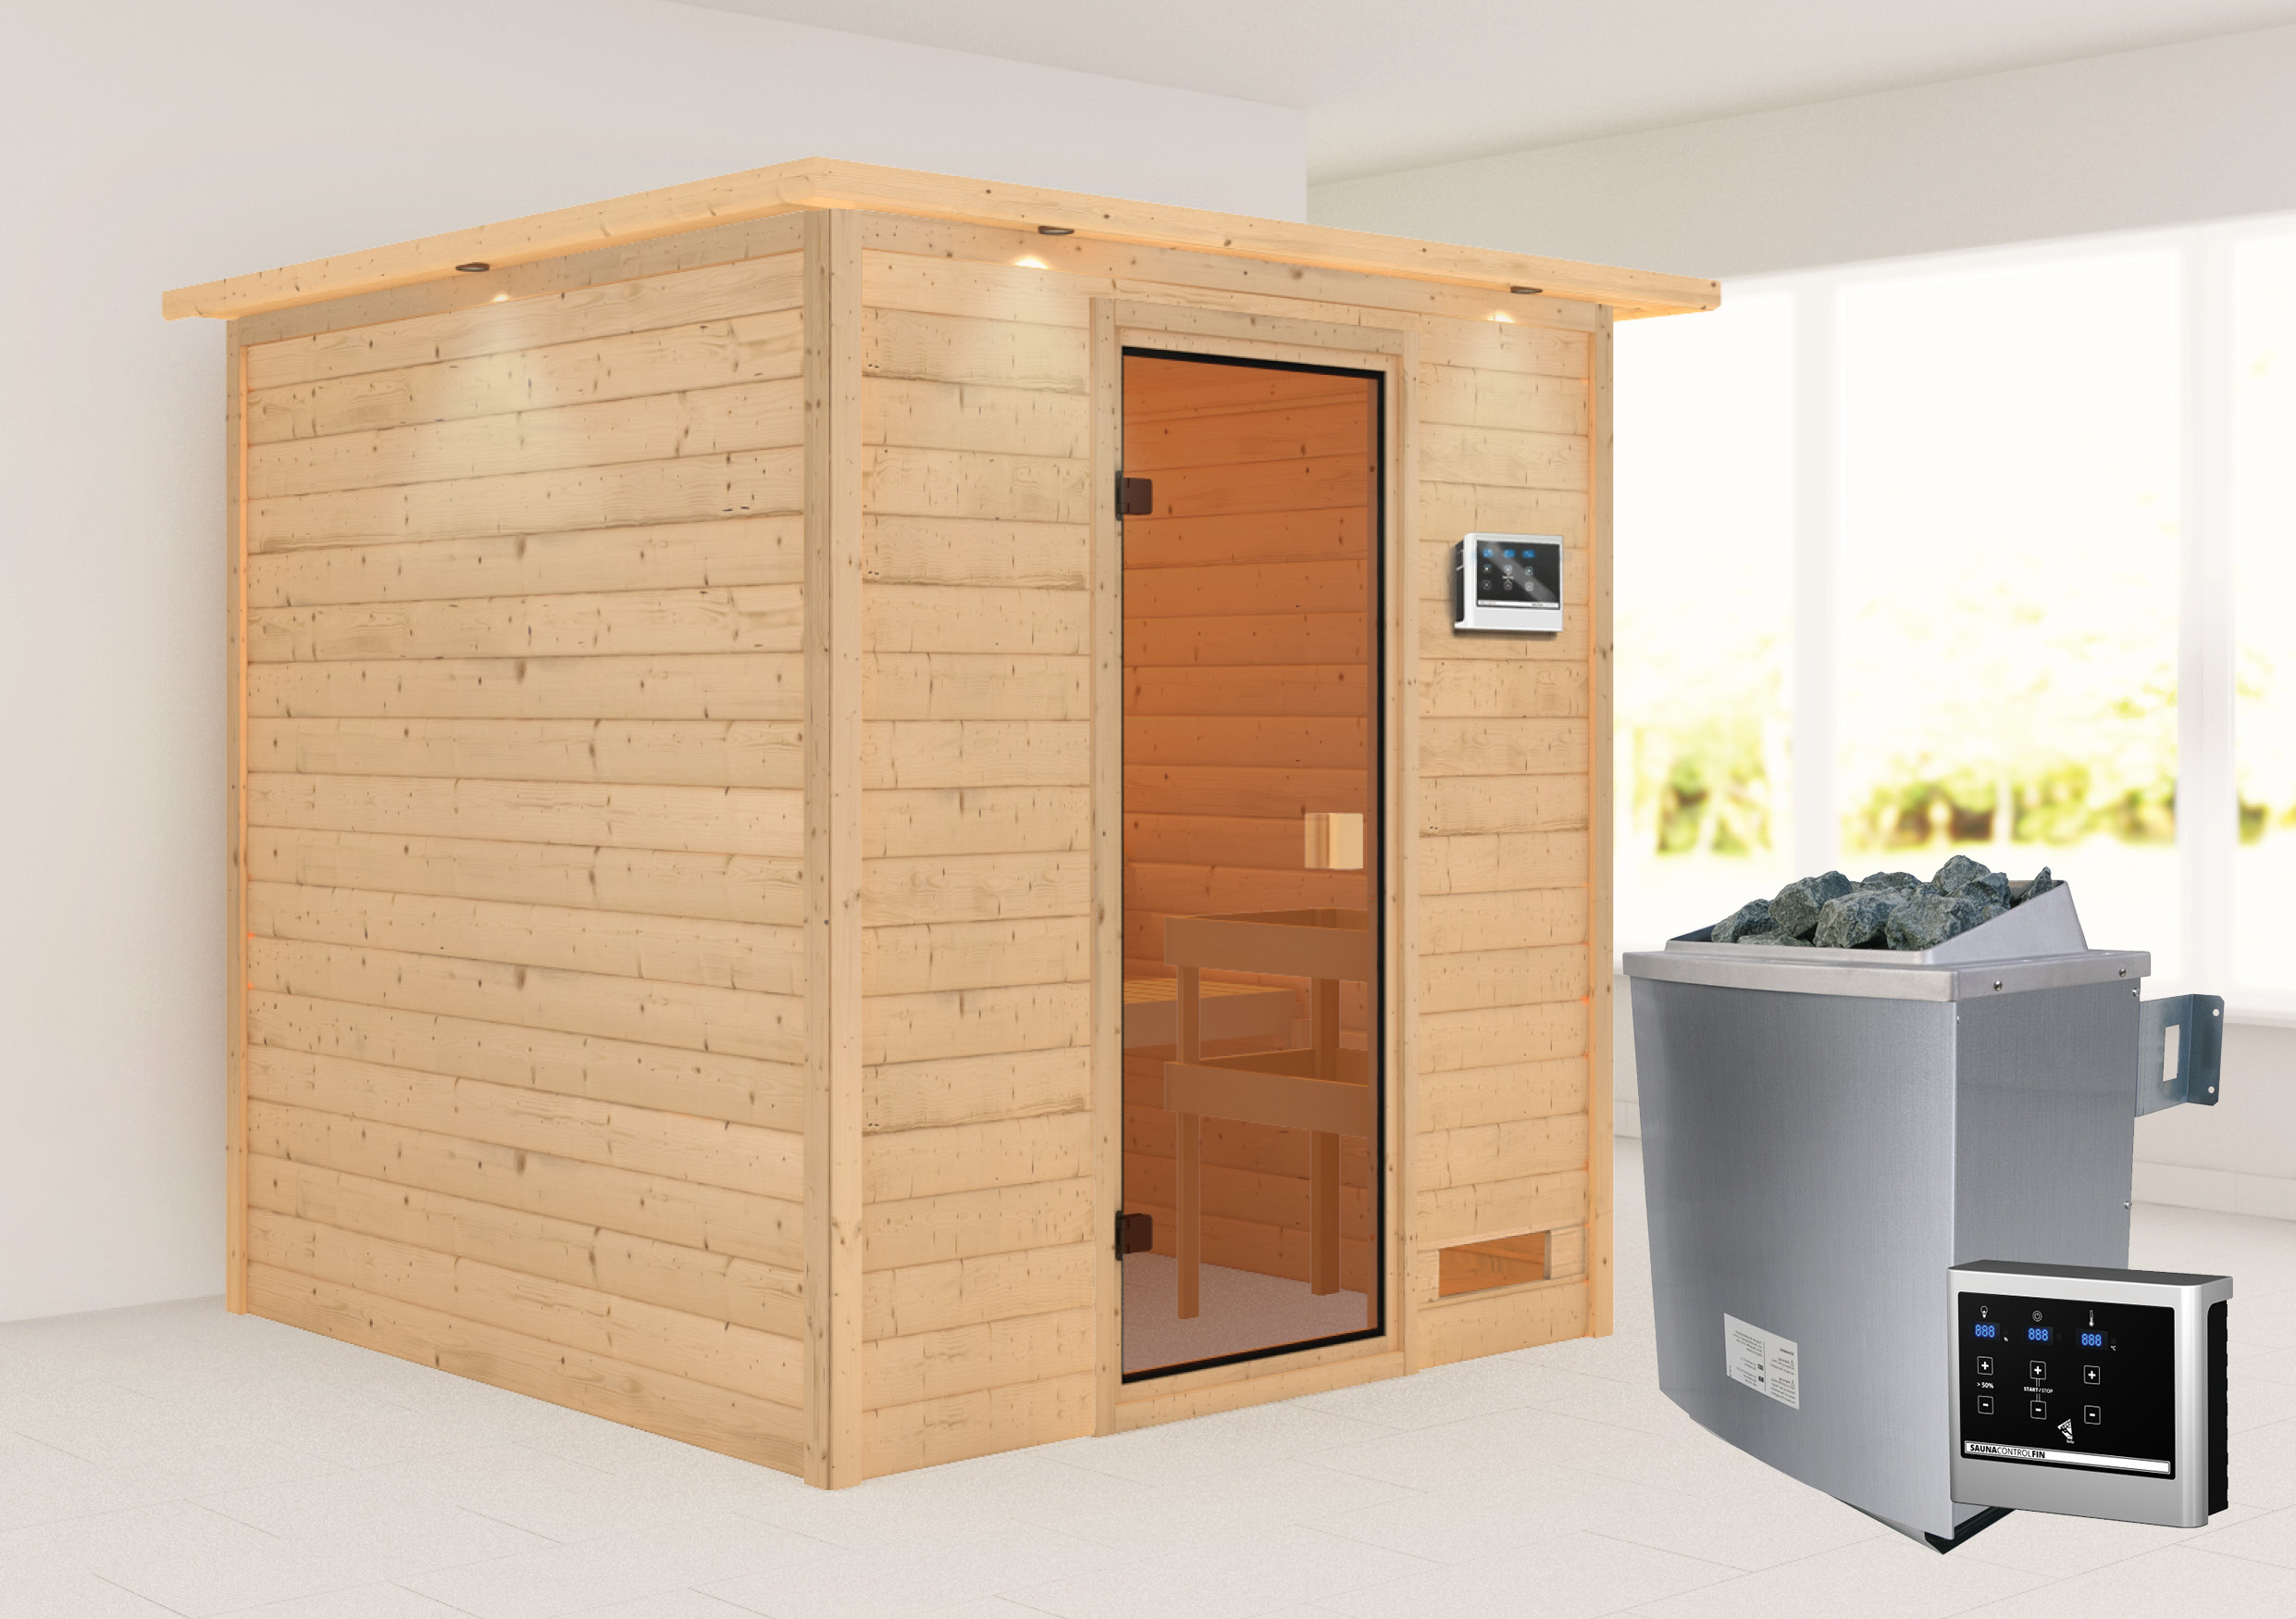 Woodfeeling Sauna Jara 38mm Dachkranz Saunaofen 9 kW extern Bild 1